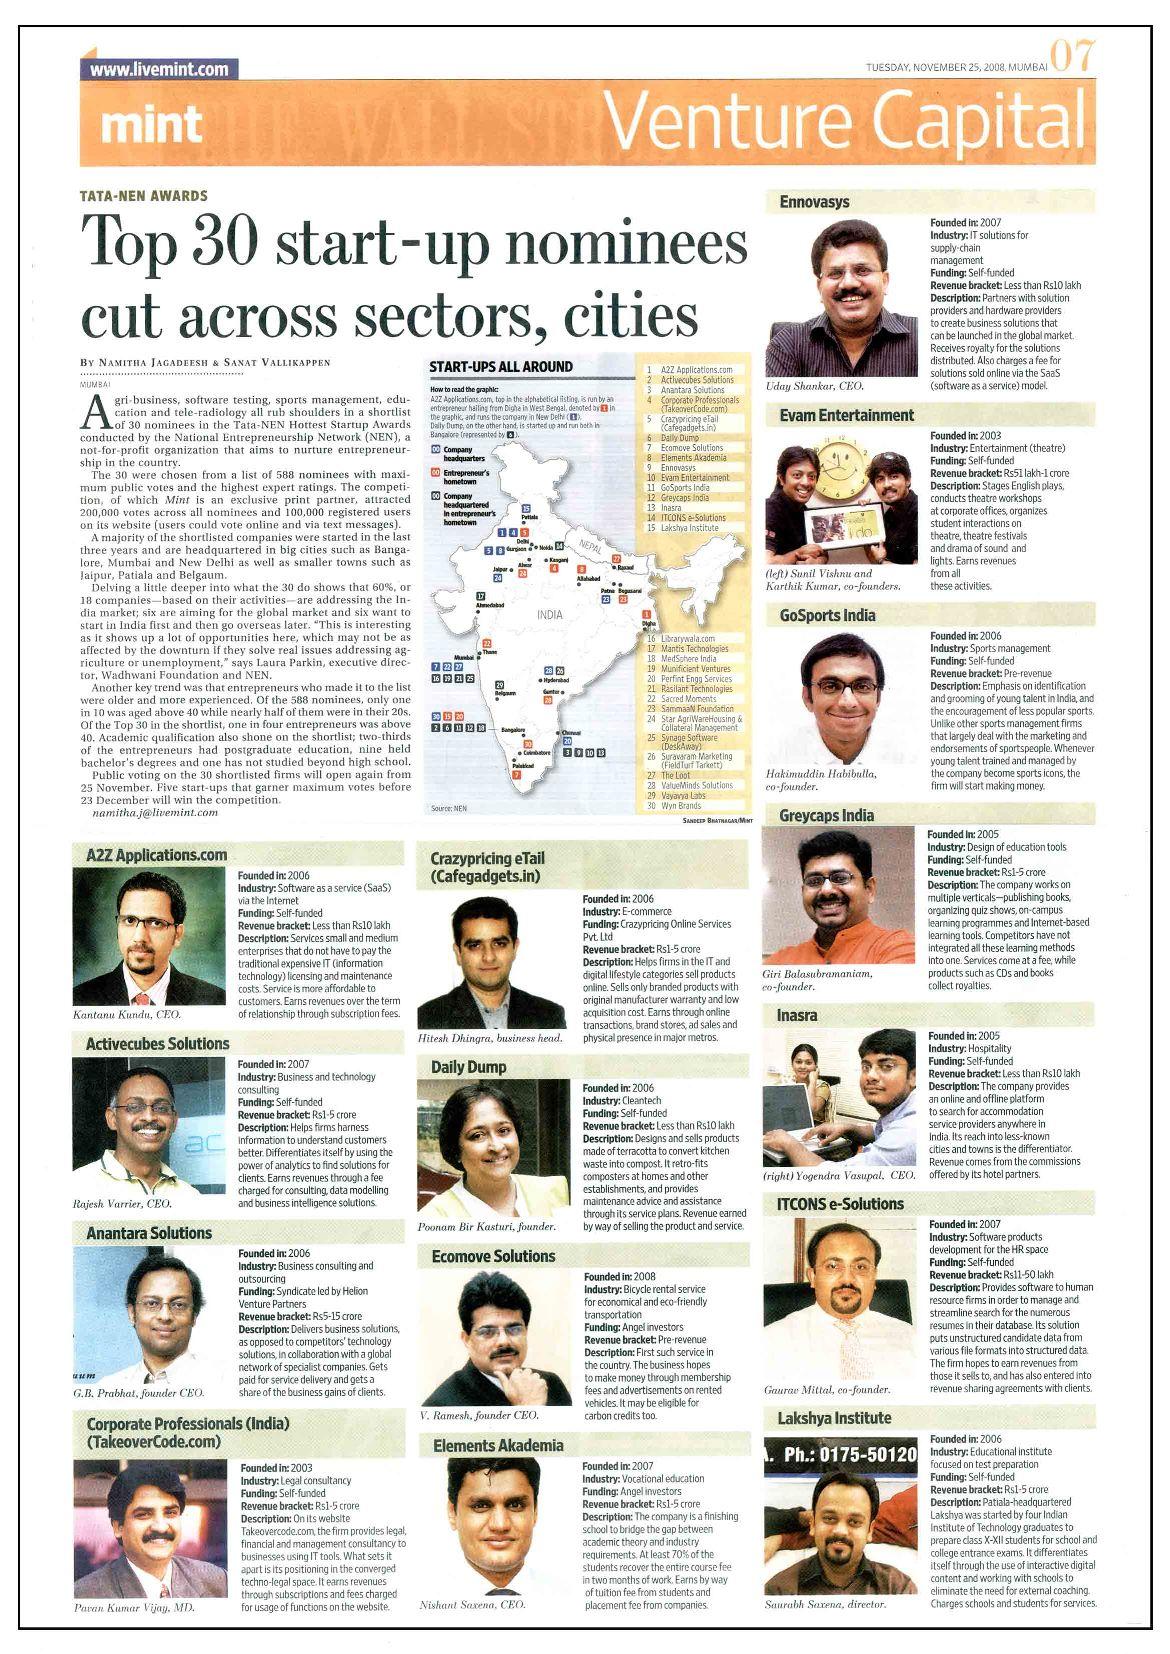 Anantara Solutions Pvt. Ltd. shortlisted for Tata-NEN Hottest Startup Award